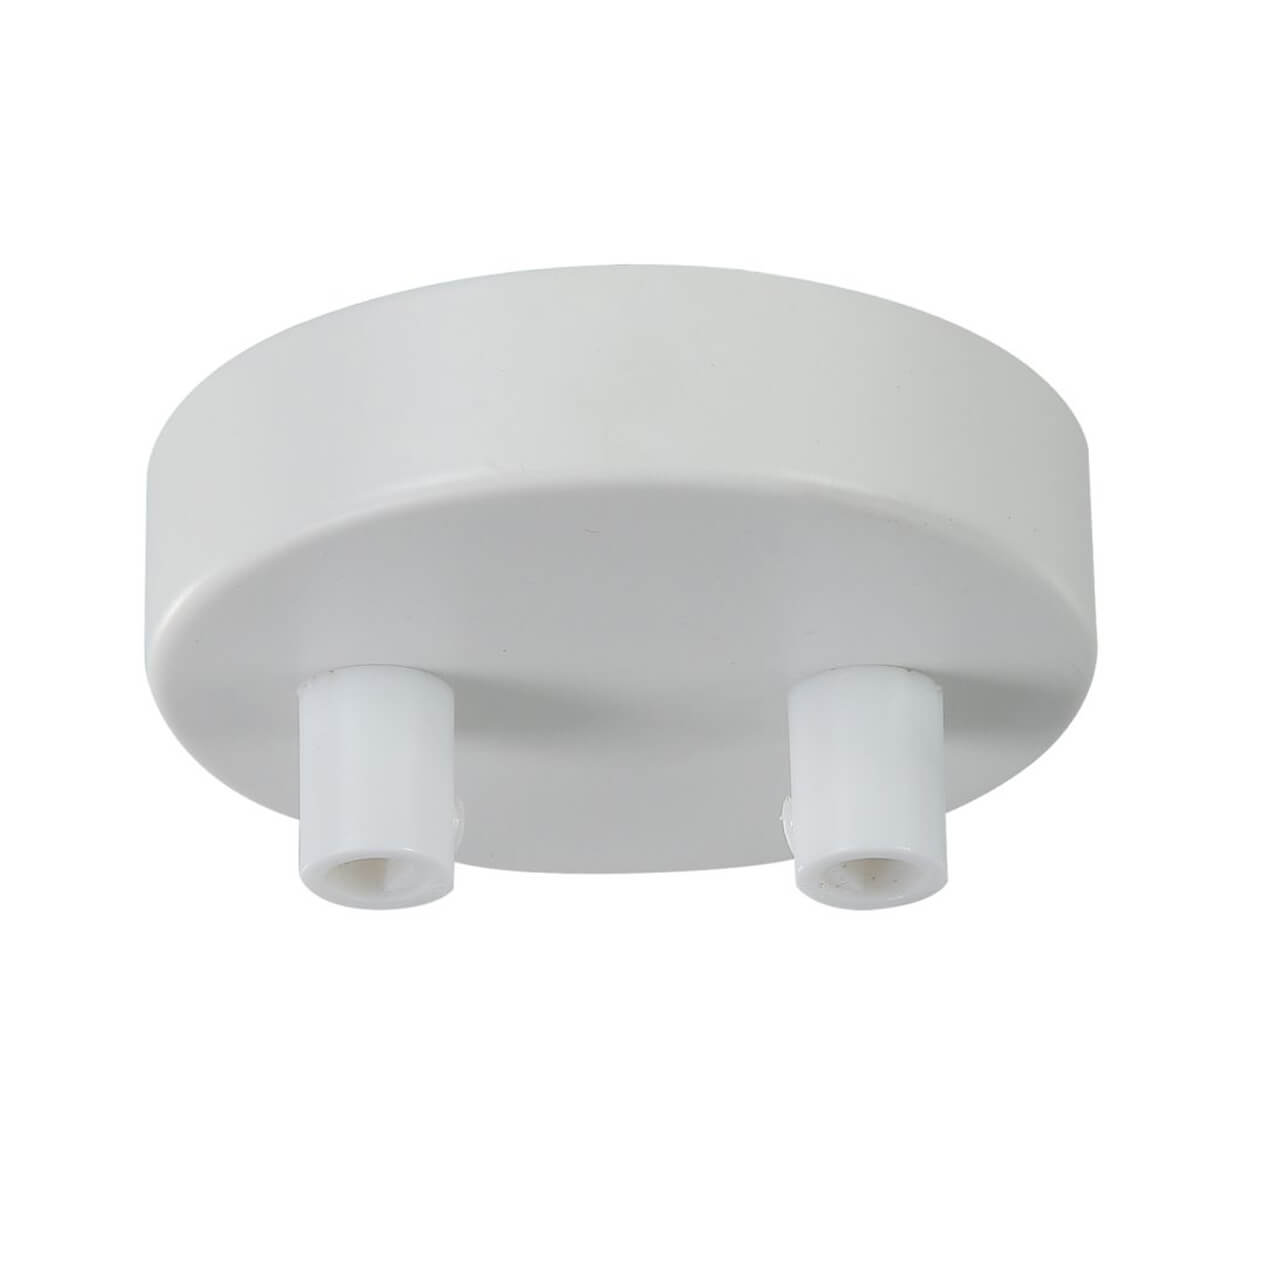 Основание для подвесного светильника Maytoni Universal Base SPR-BASE-R-02-W цена